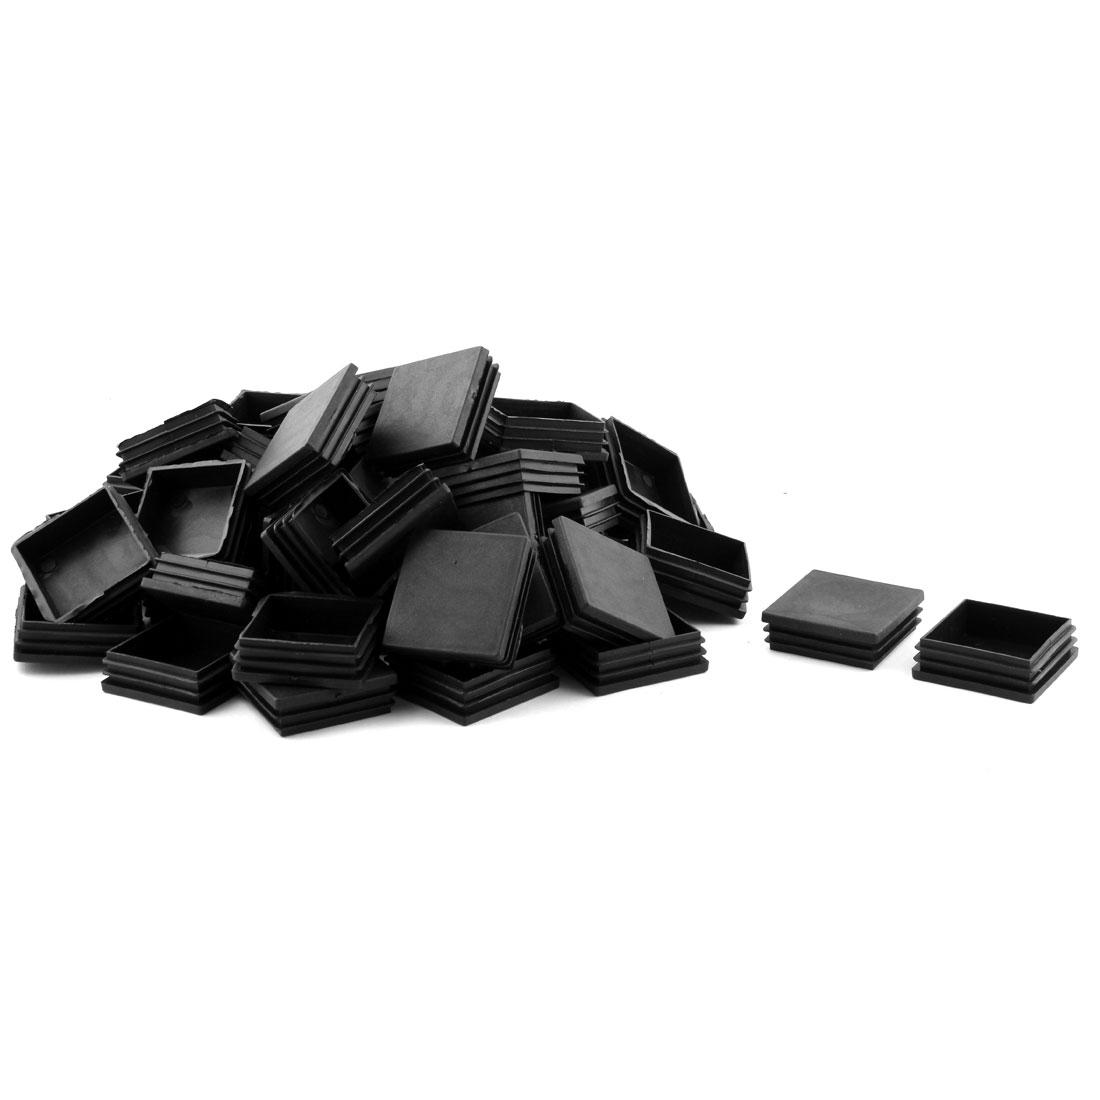 Plastic Square Threaded Furniture Desk Chair Leg Tube Insert Caps Black 60 x 60mm 50 Pcs